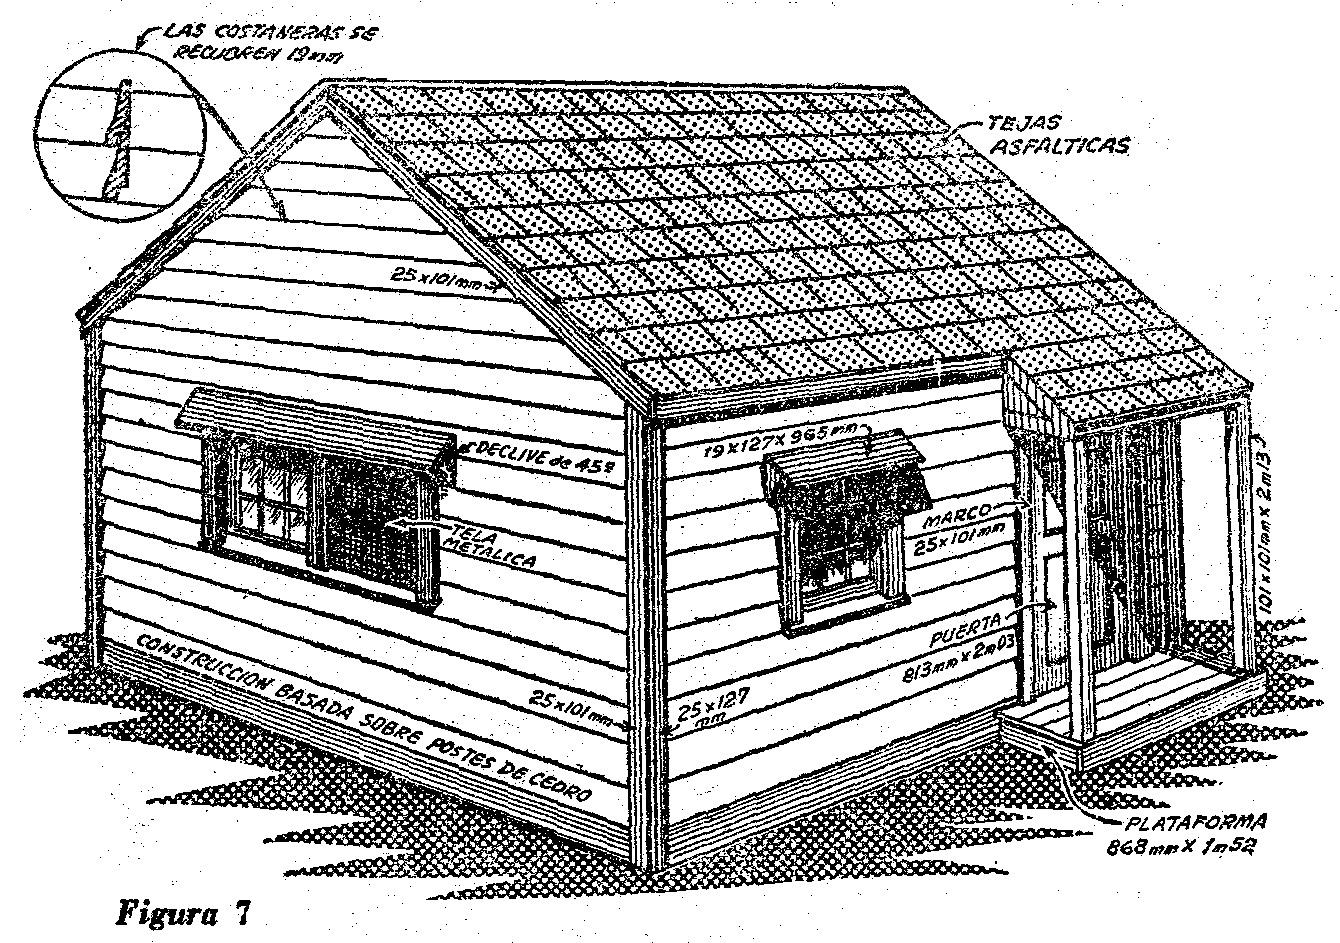 Construir caseta de madera cuartos casetas modulos de - Hacer caseta de madera ...